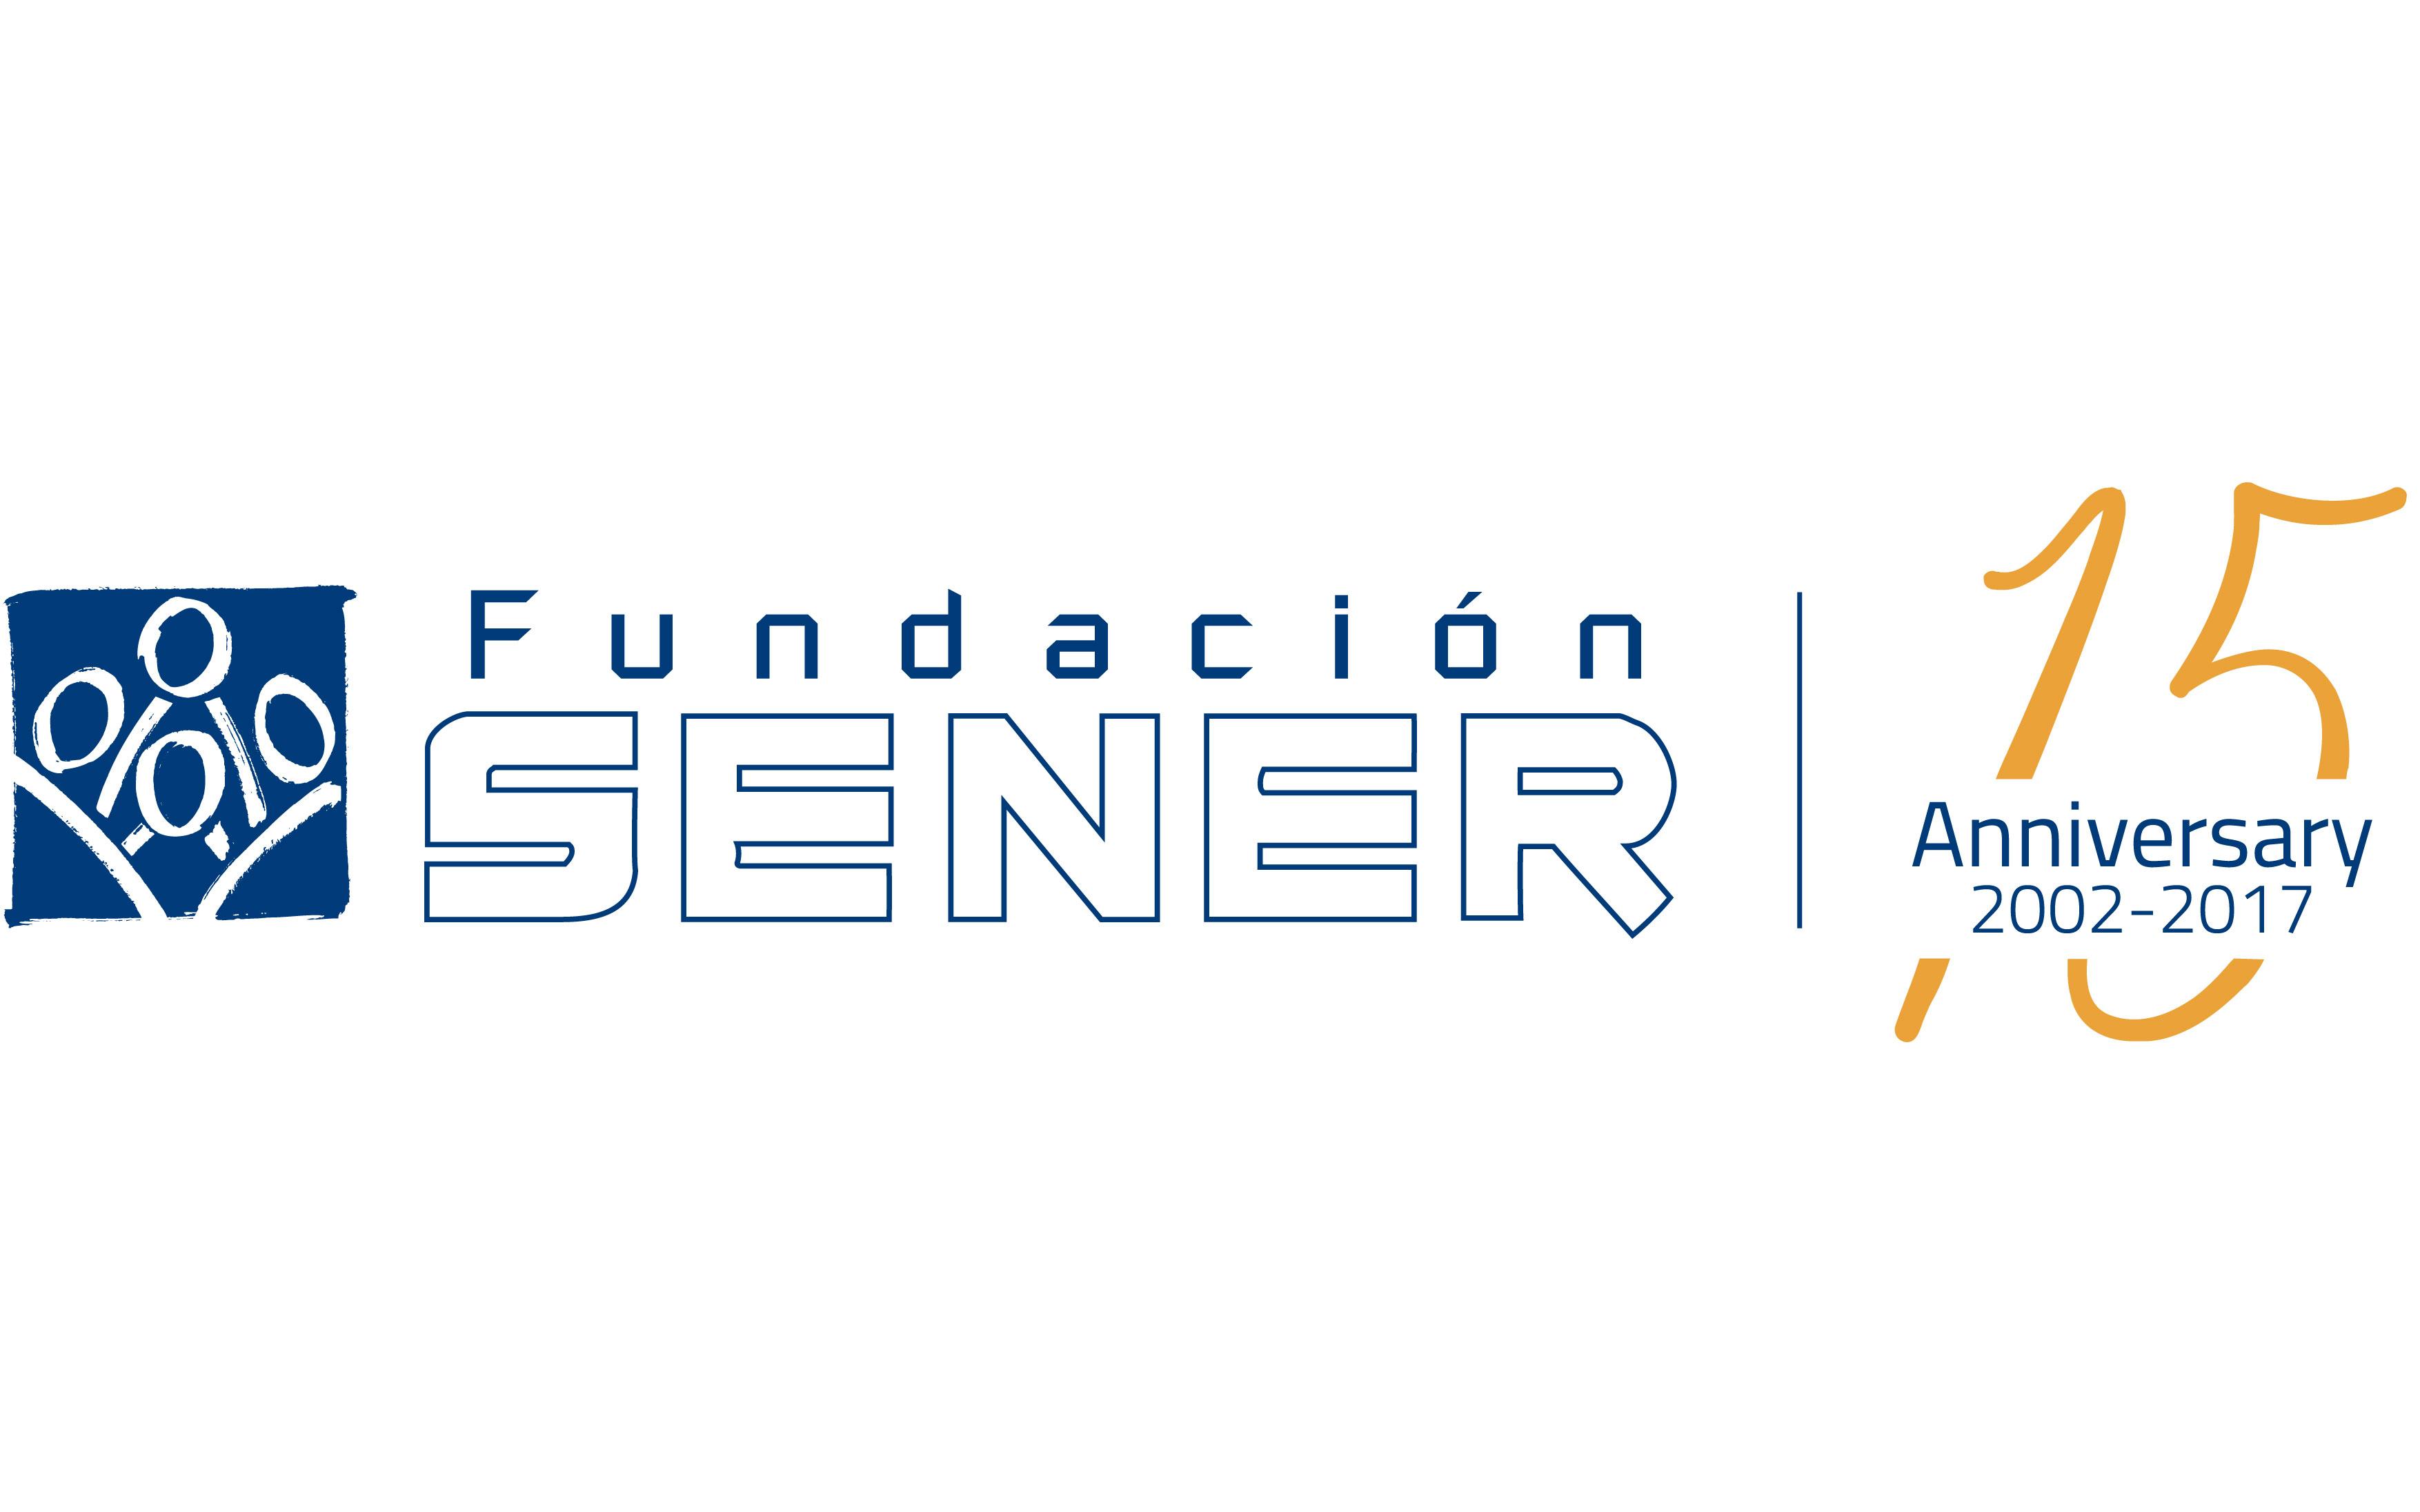 http://www.poweroilandgas.sener/ecm-images/fundacion-sener-15-aniversario-1_replica_replica